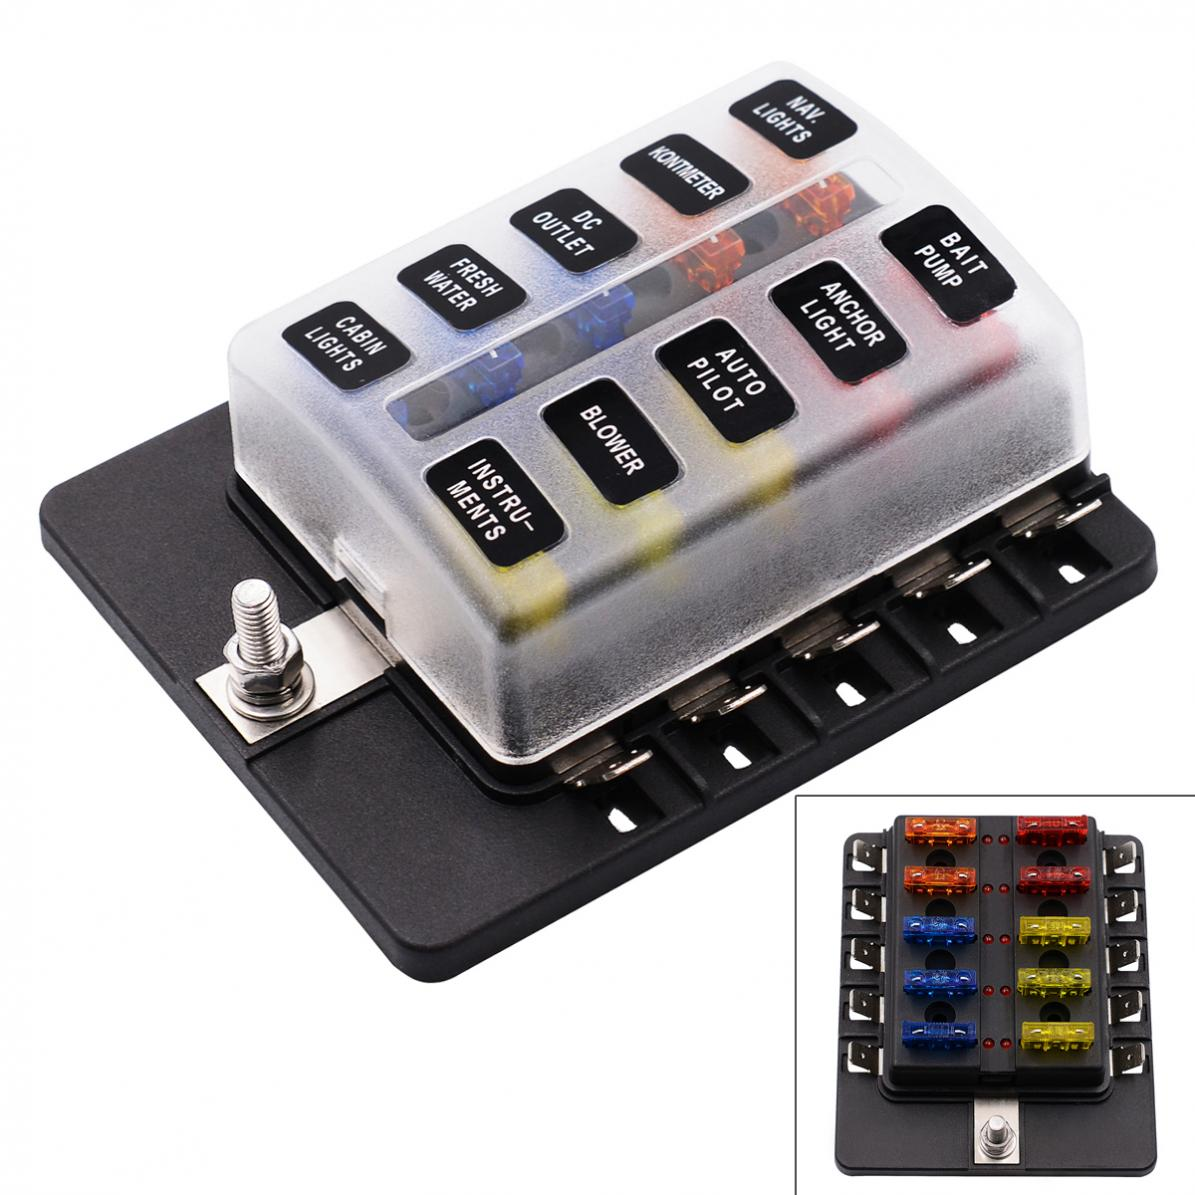 10 Way Blade Fuse Box Blade Holder Bus Bar LED Warning Light Car Marine